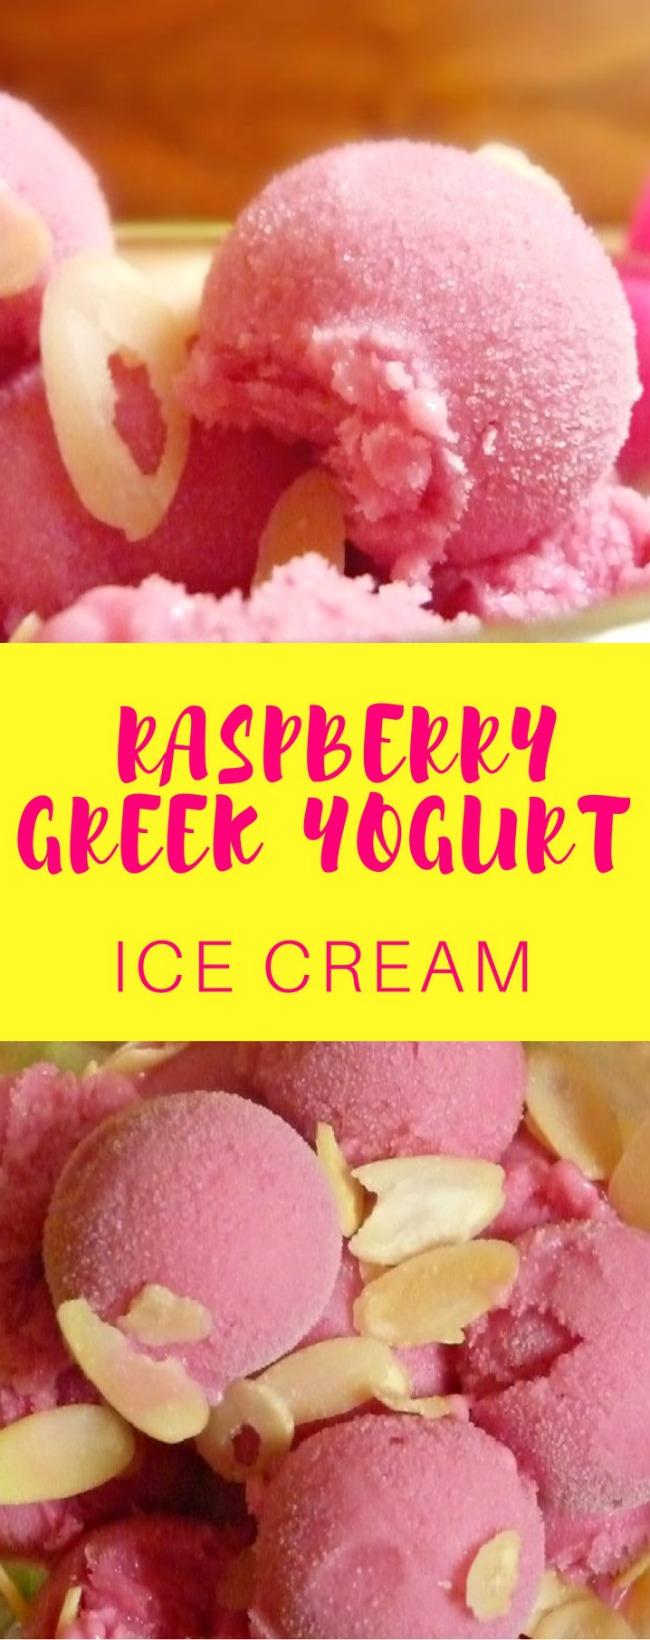 Raspberry Greek Yogurt Ice Cream Recipe